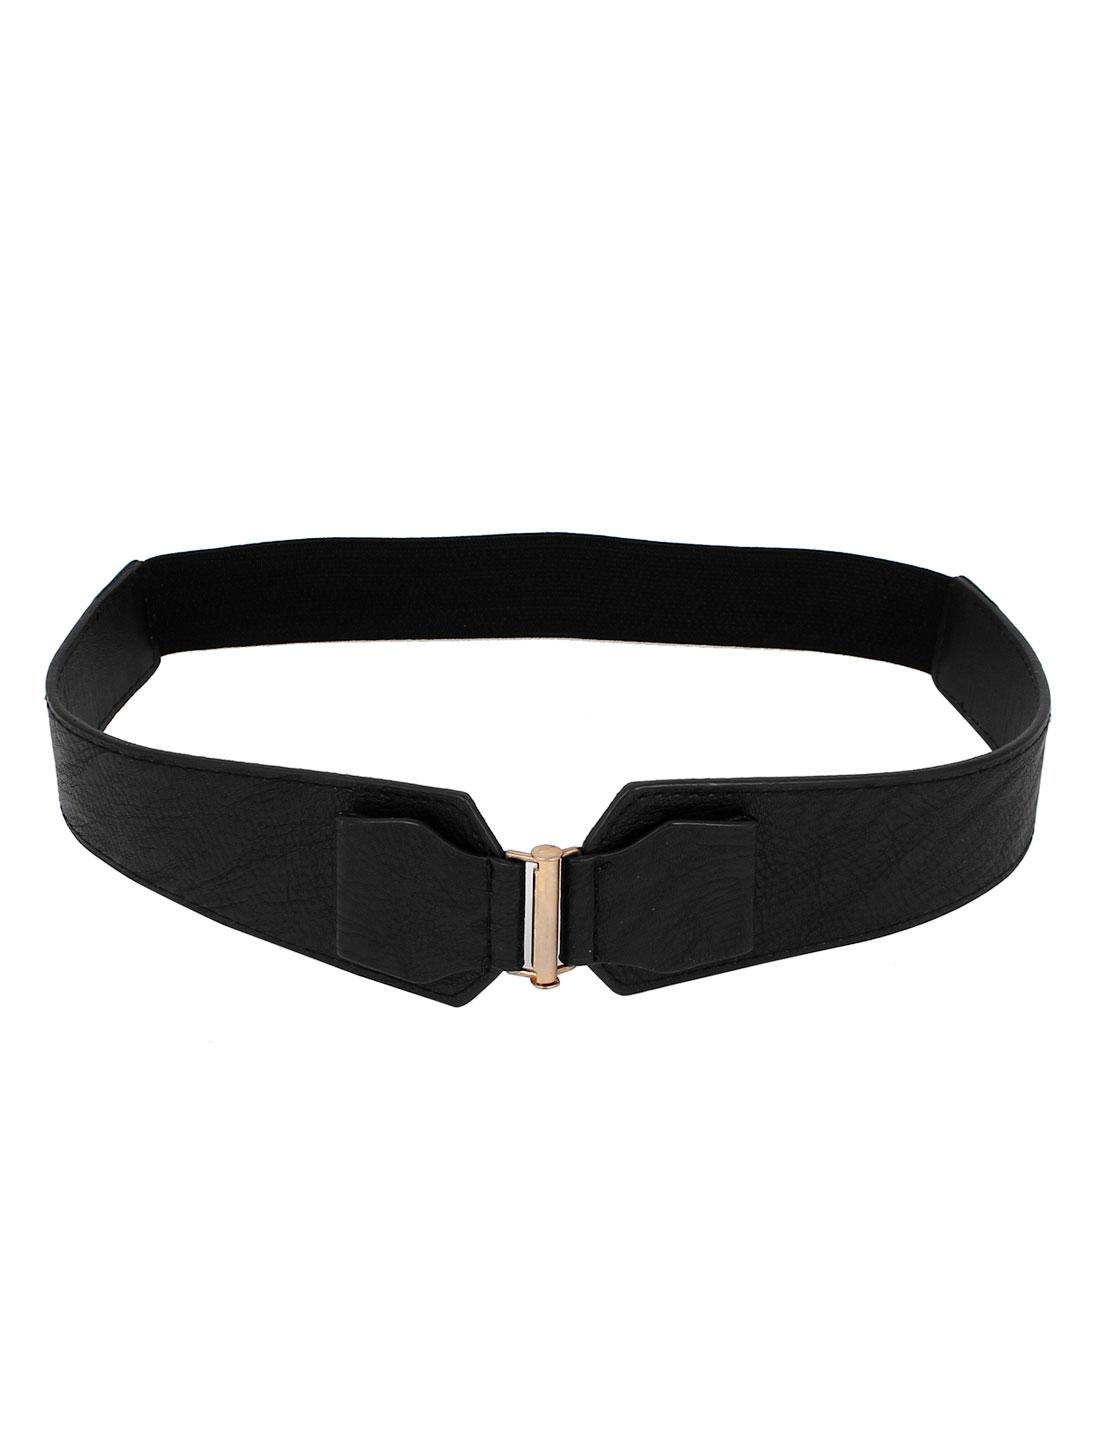 Women Interlock Buckle Stretchy 3cm Width Faux Leather Cinch Waist Belt Waistband Black